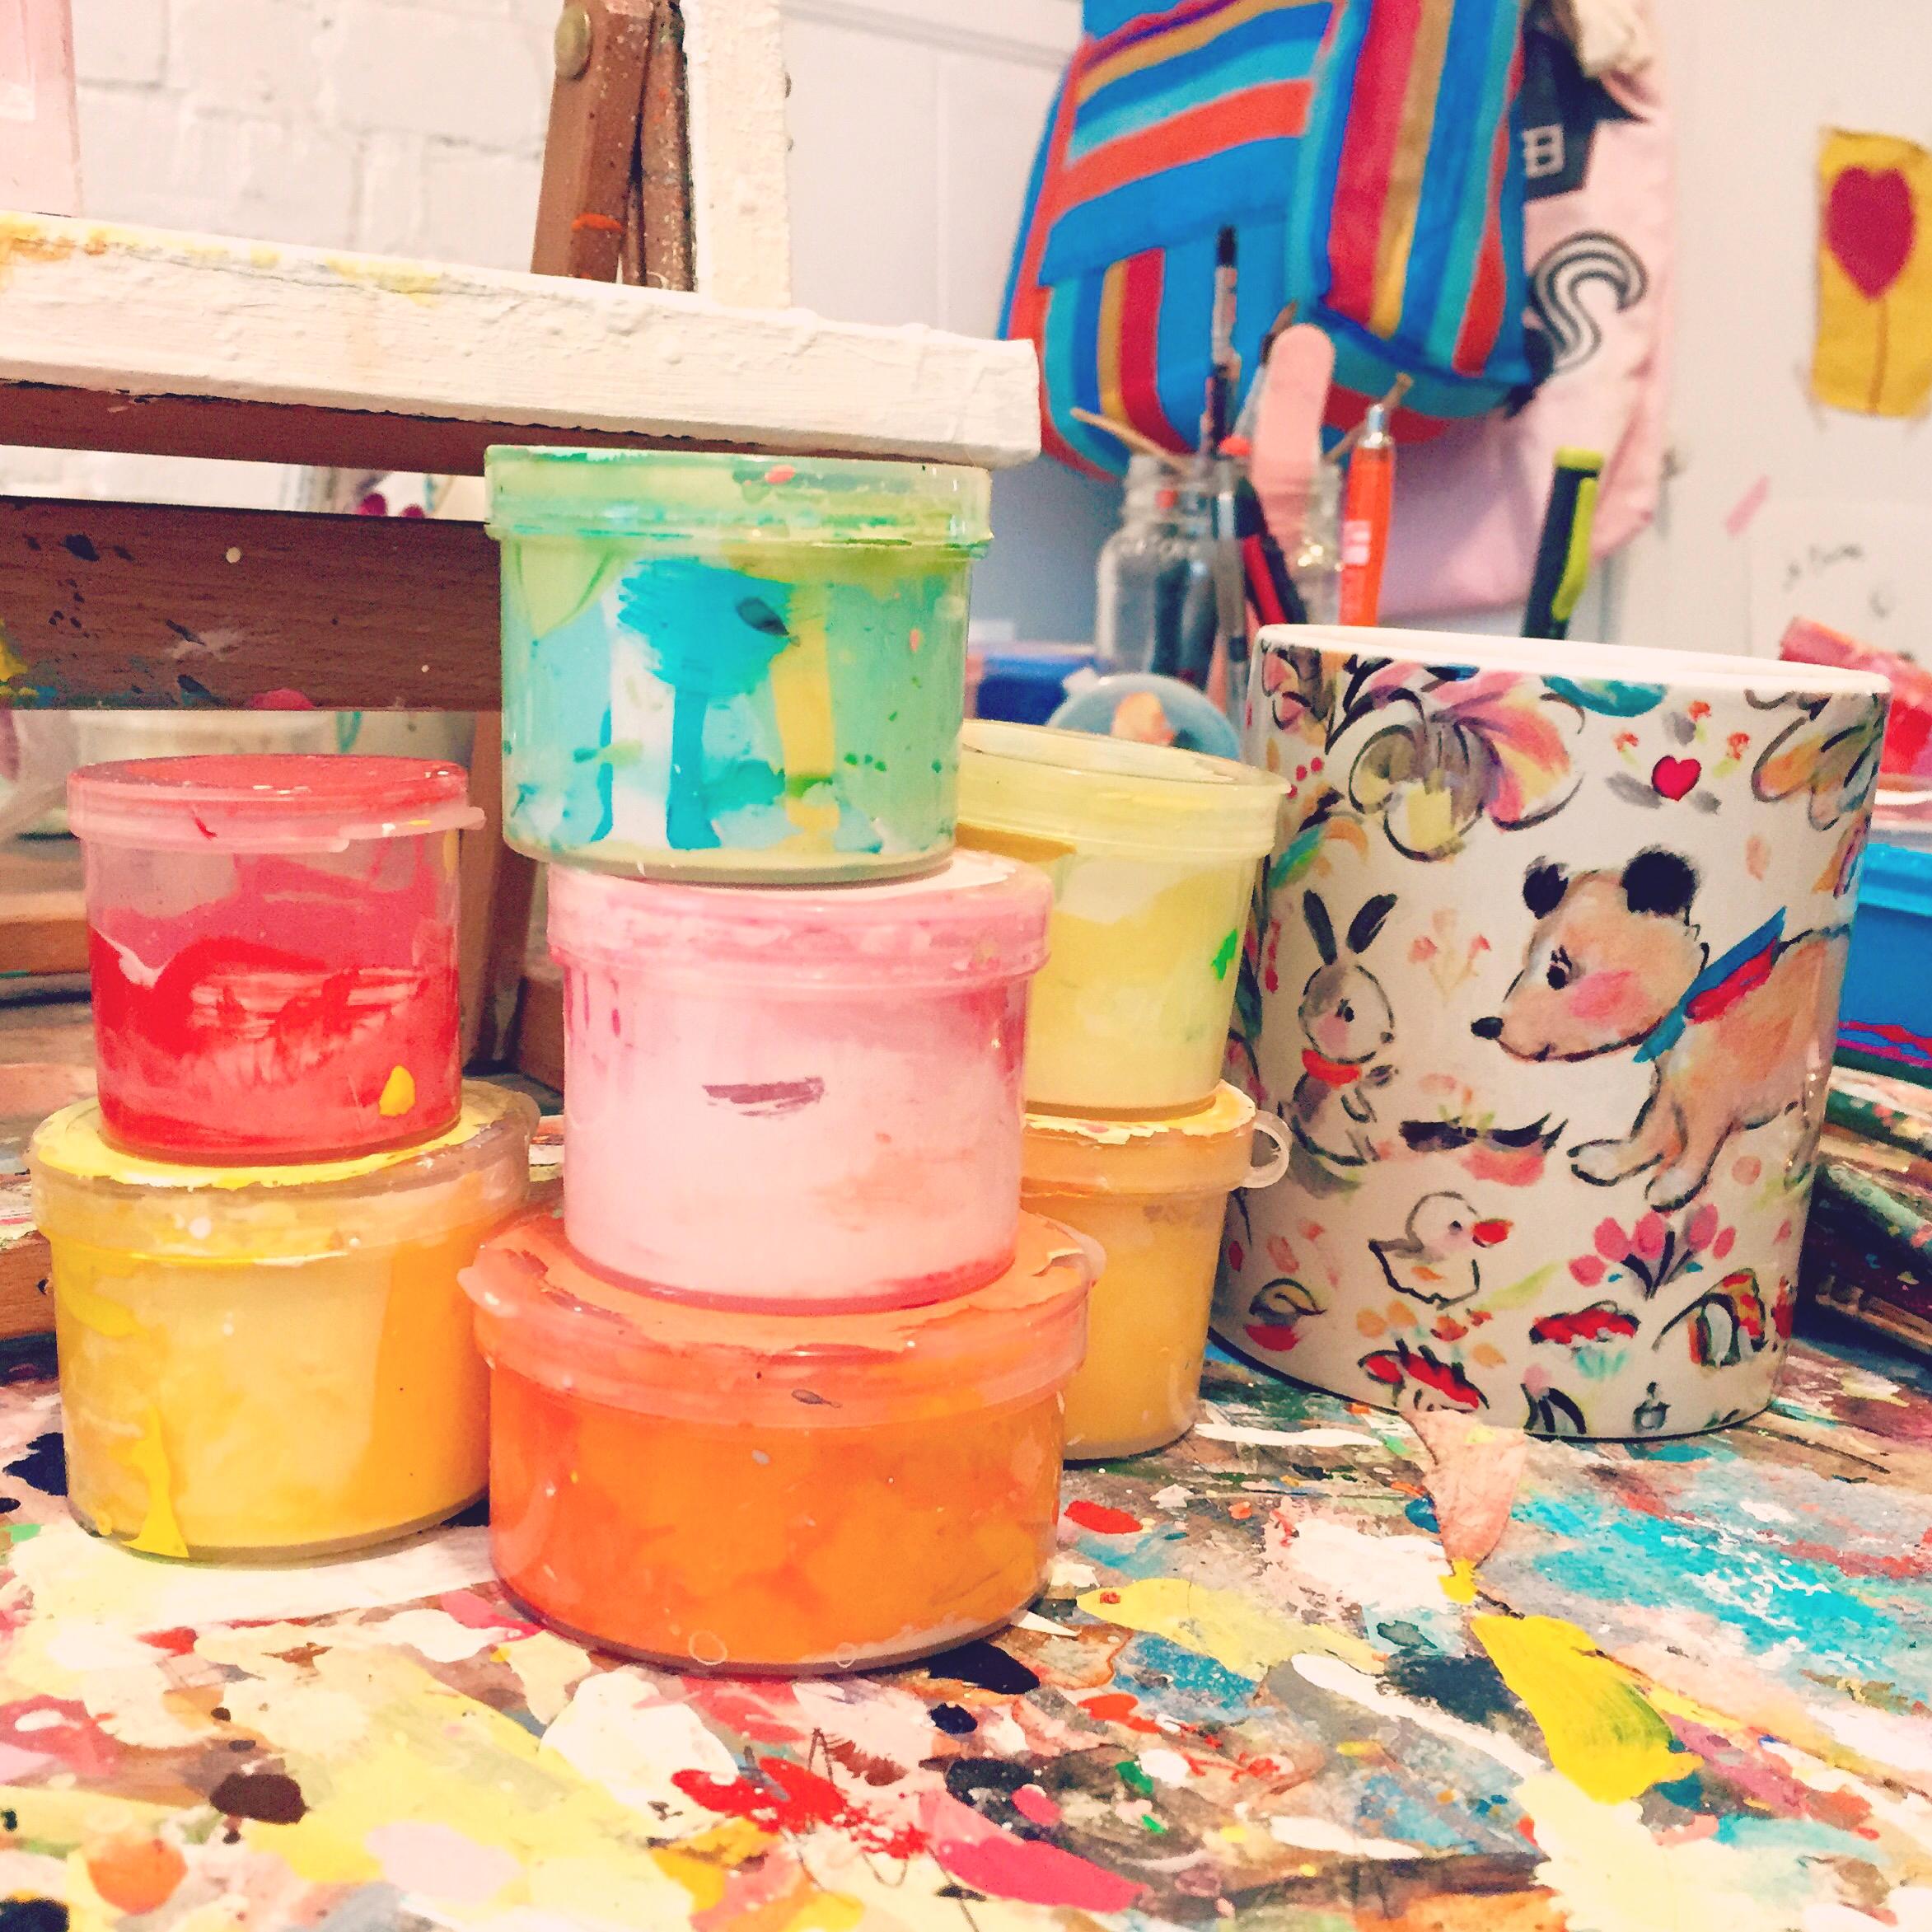 Allyn_Howard_paints_mug_table_studio.jpg